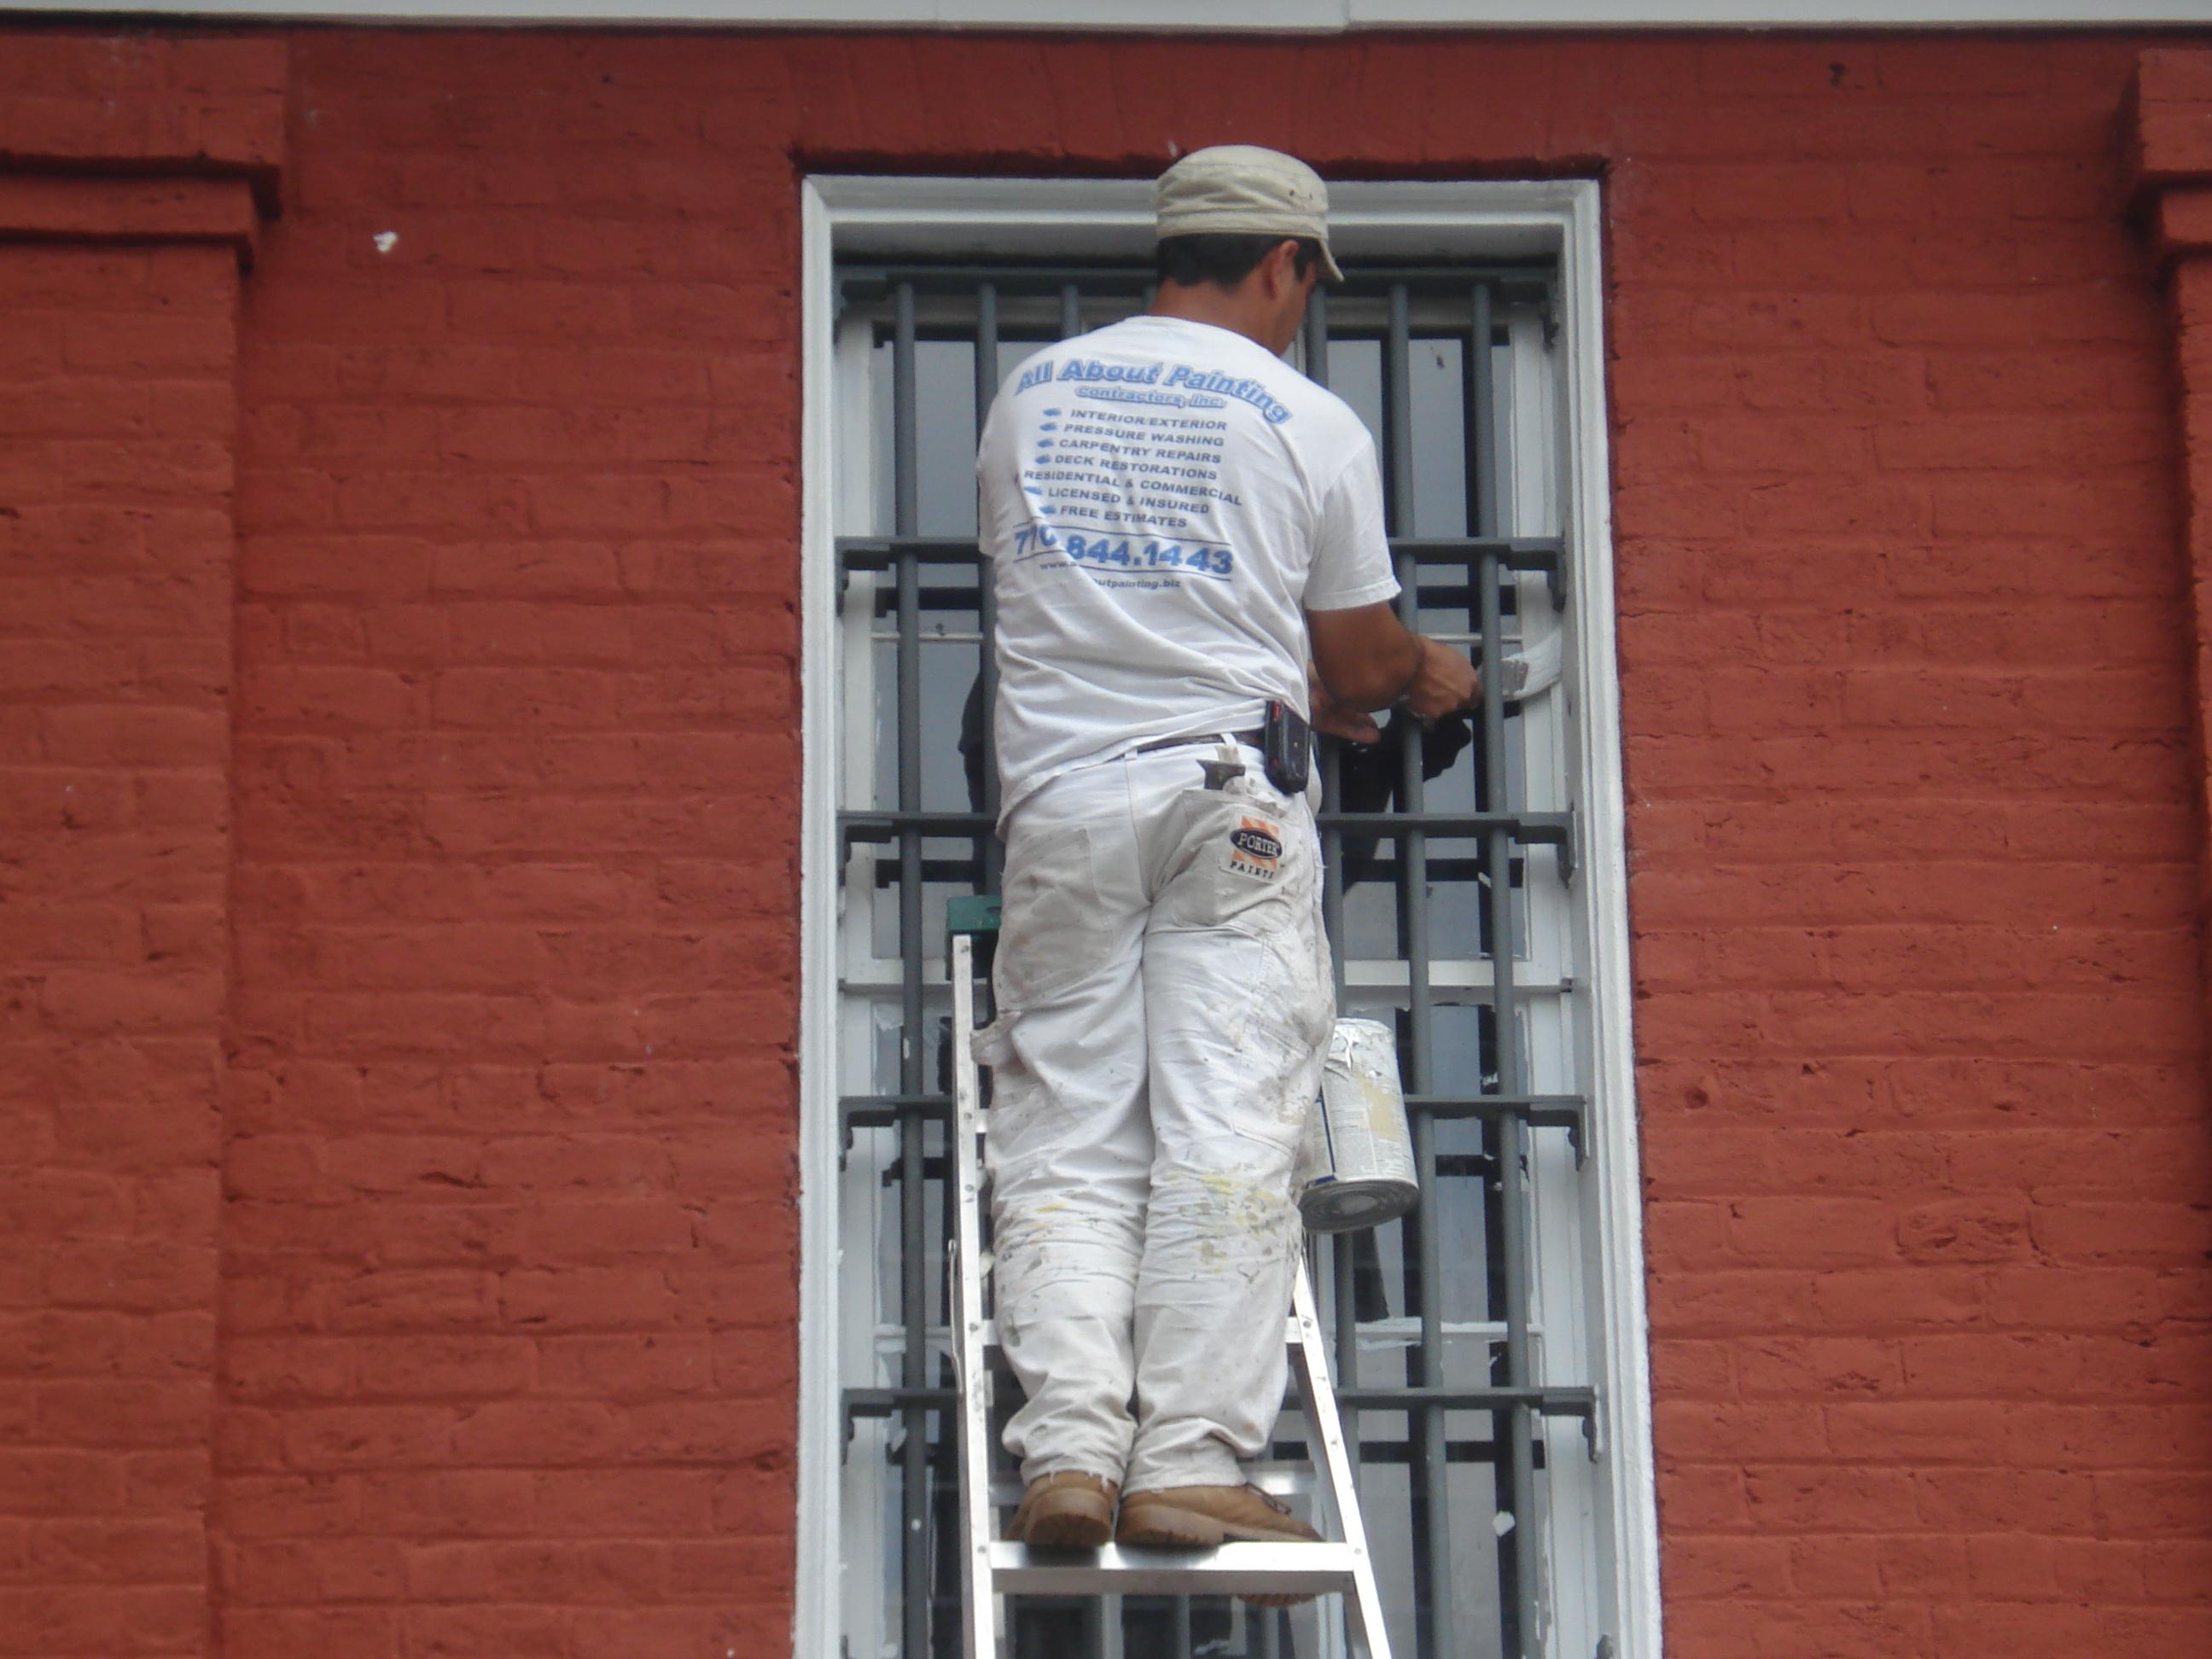 All about painting contractors inc cumming ga 30041 - Interior painting company atlanta ga ...